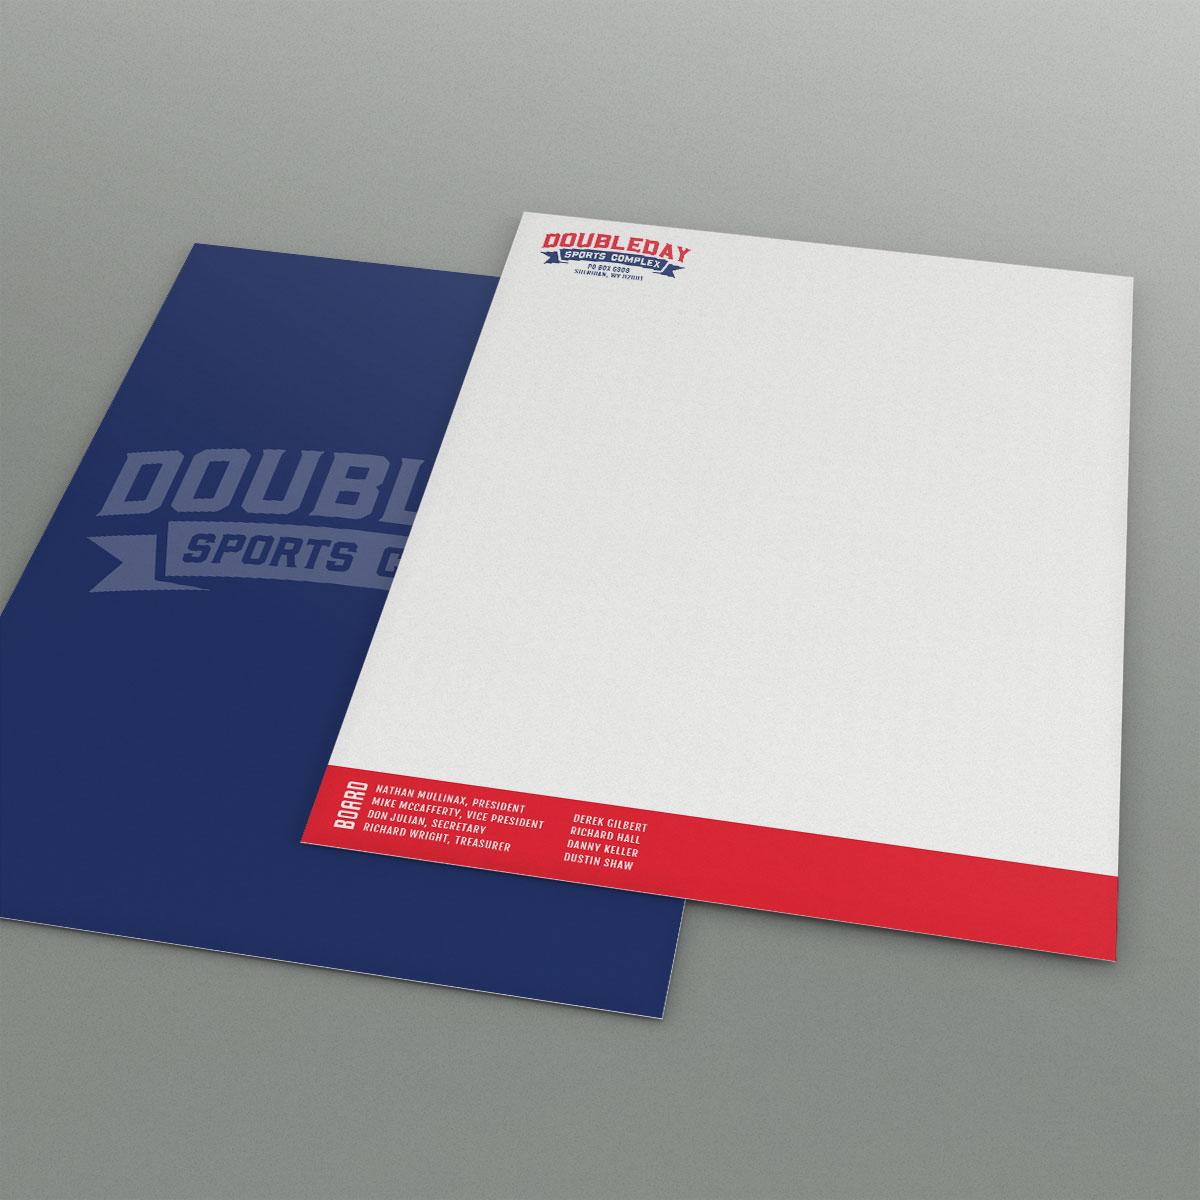 Doubleday Sports Complex Letterhead design